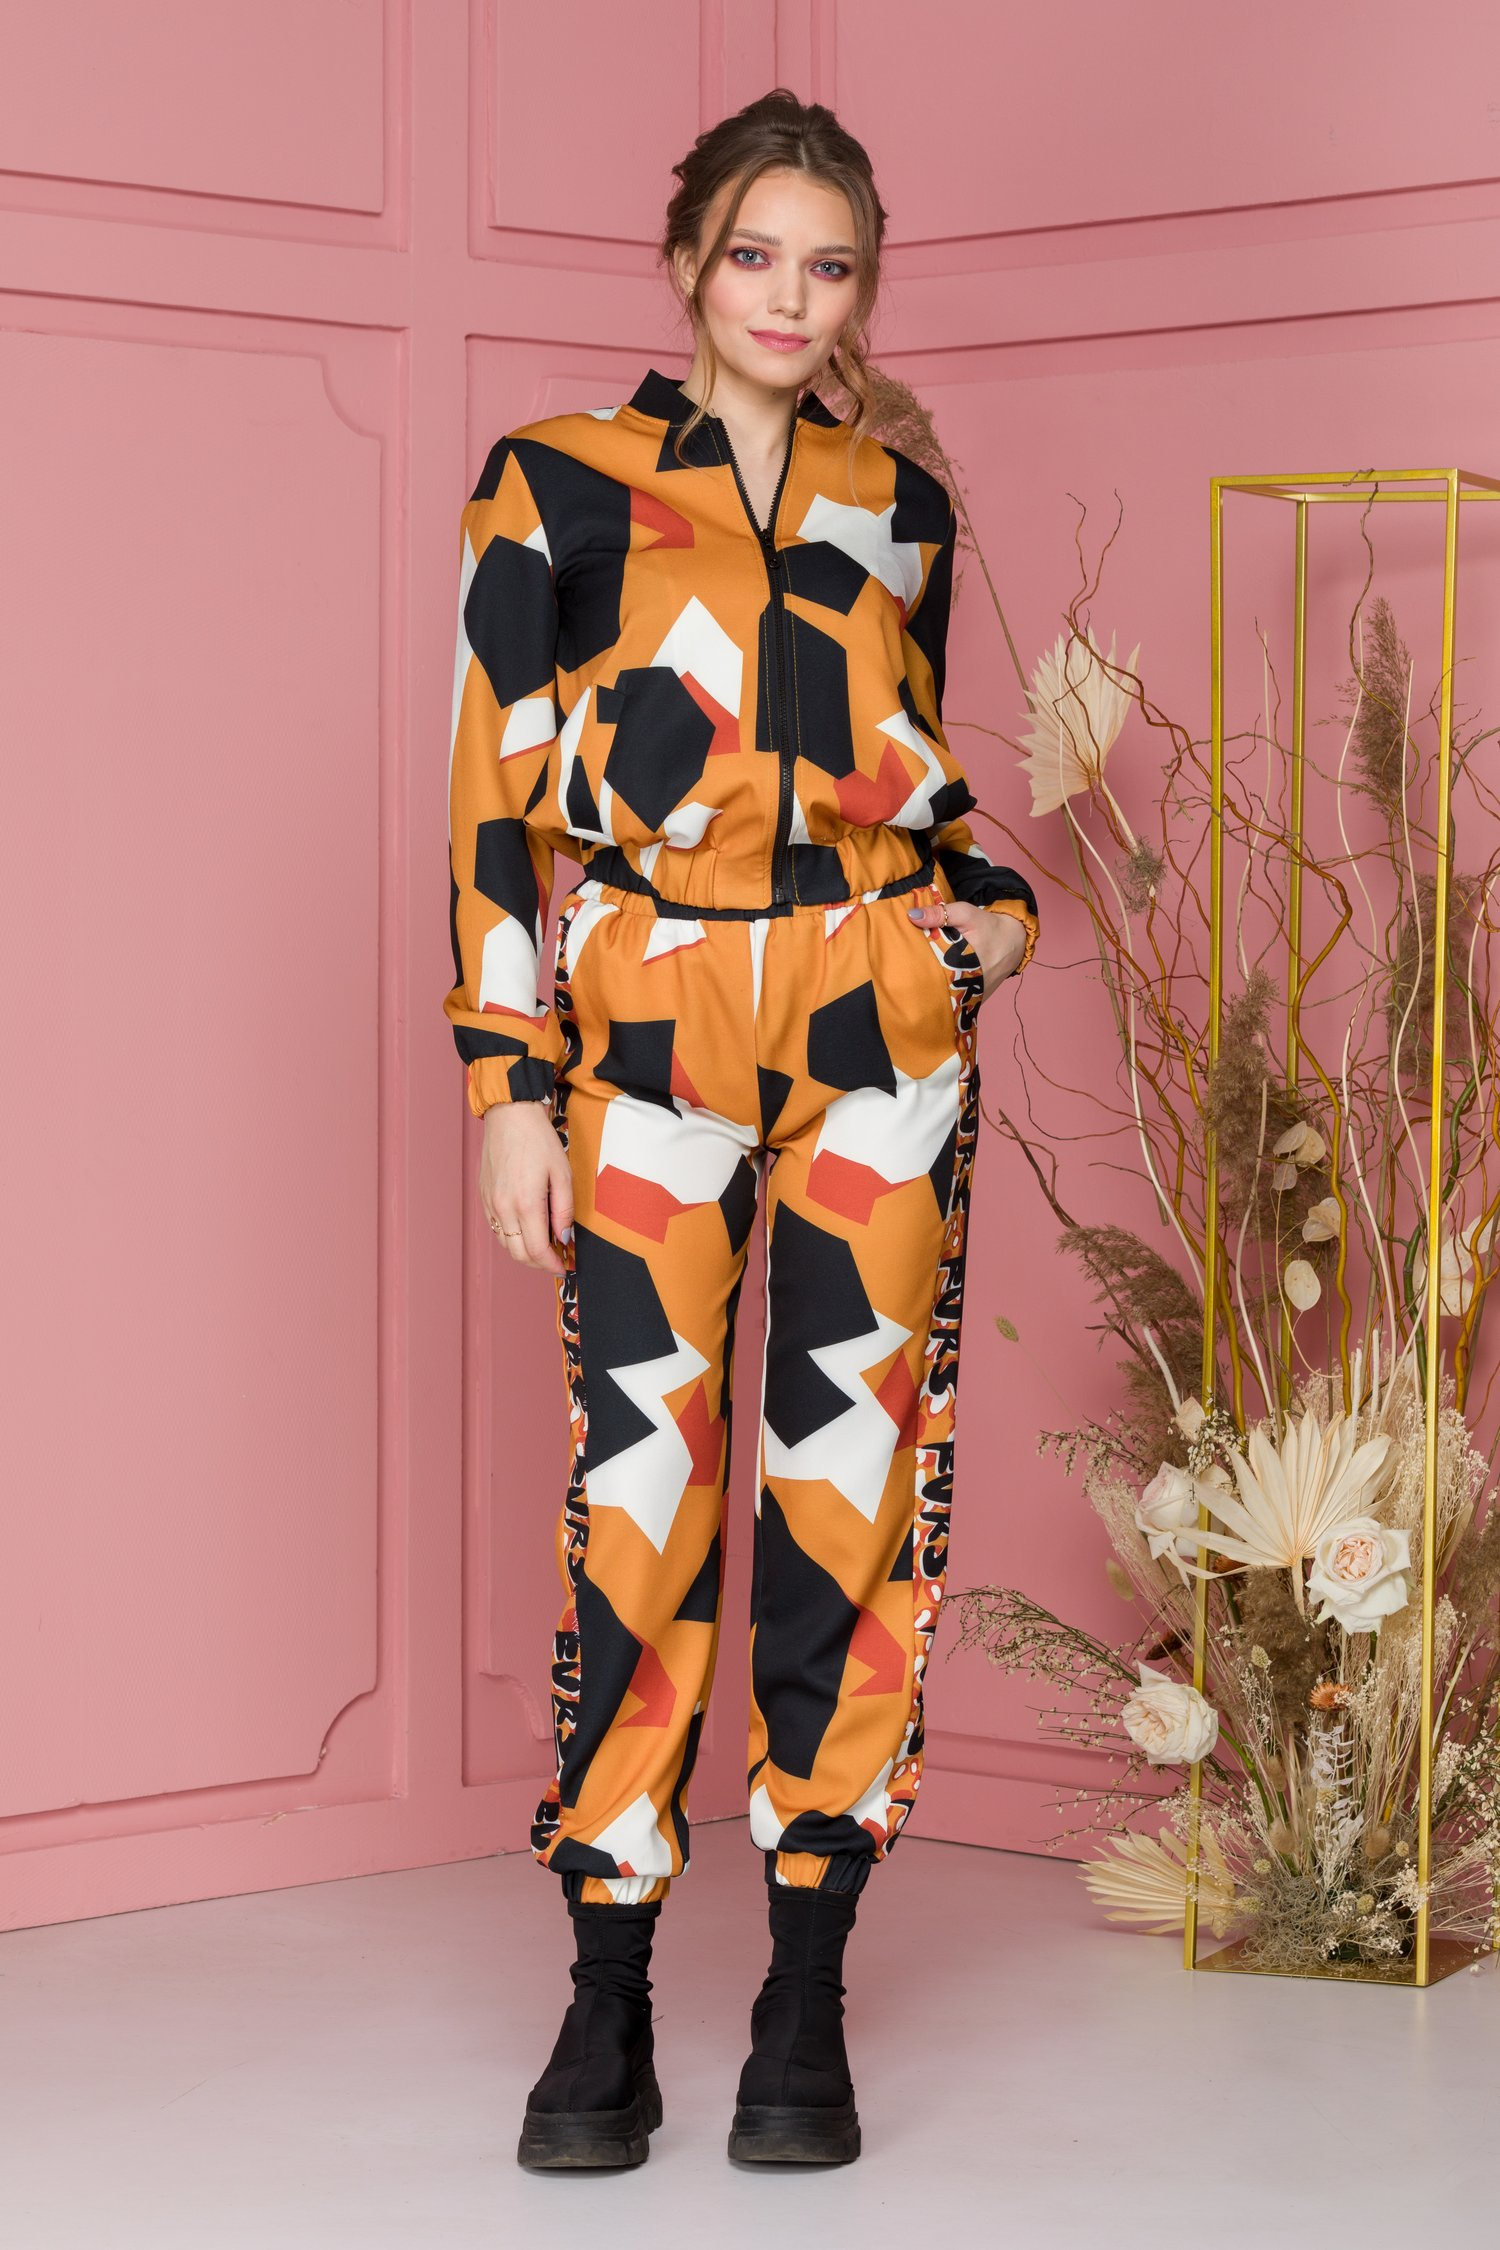 Costum sport orange cu imprimeu abstract - costum sport orange cu imprimeu abstract 489162 4 - Costum sport orange cu imprimeu abstract